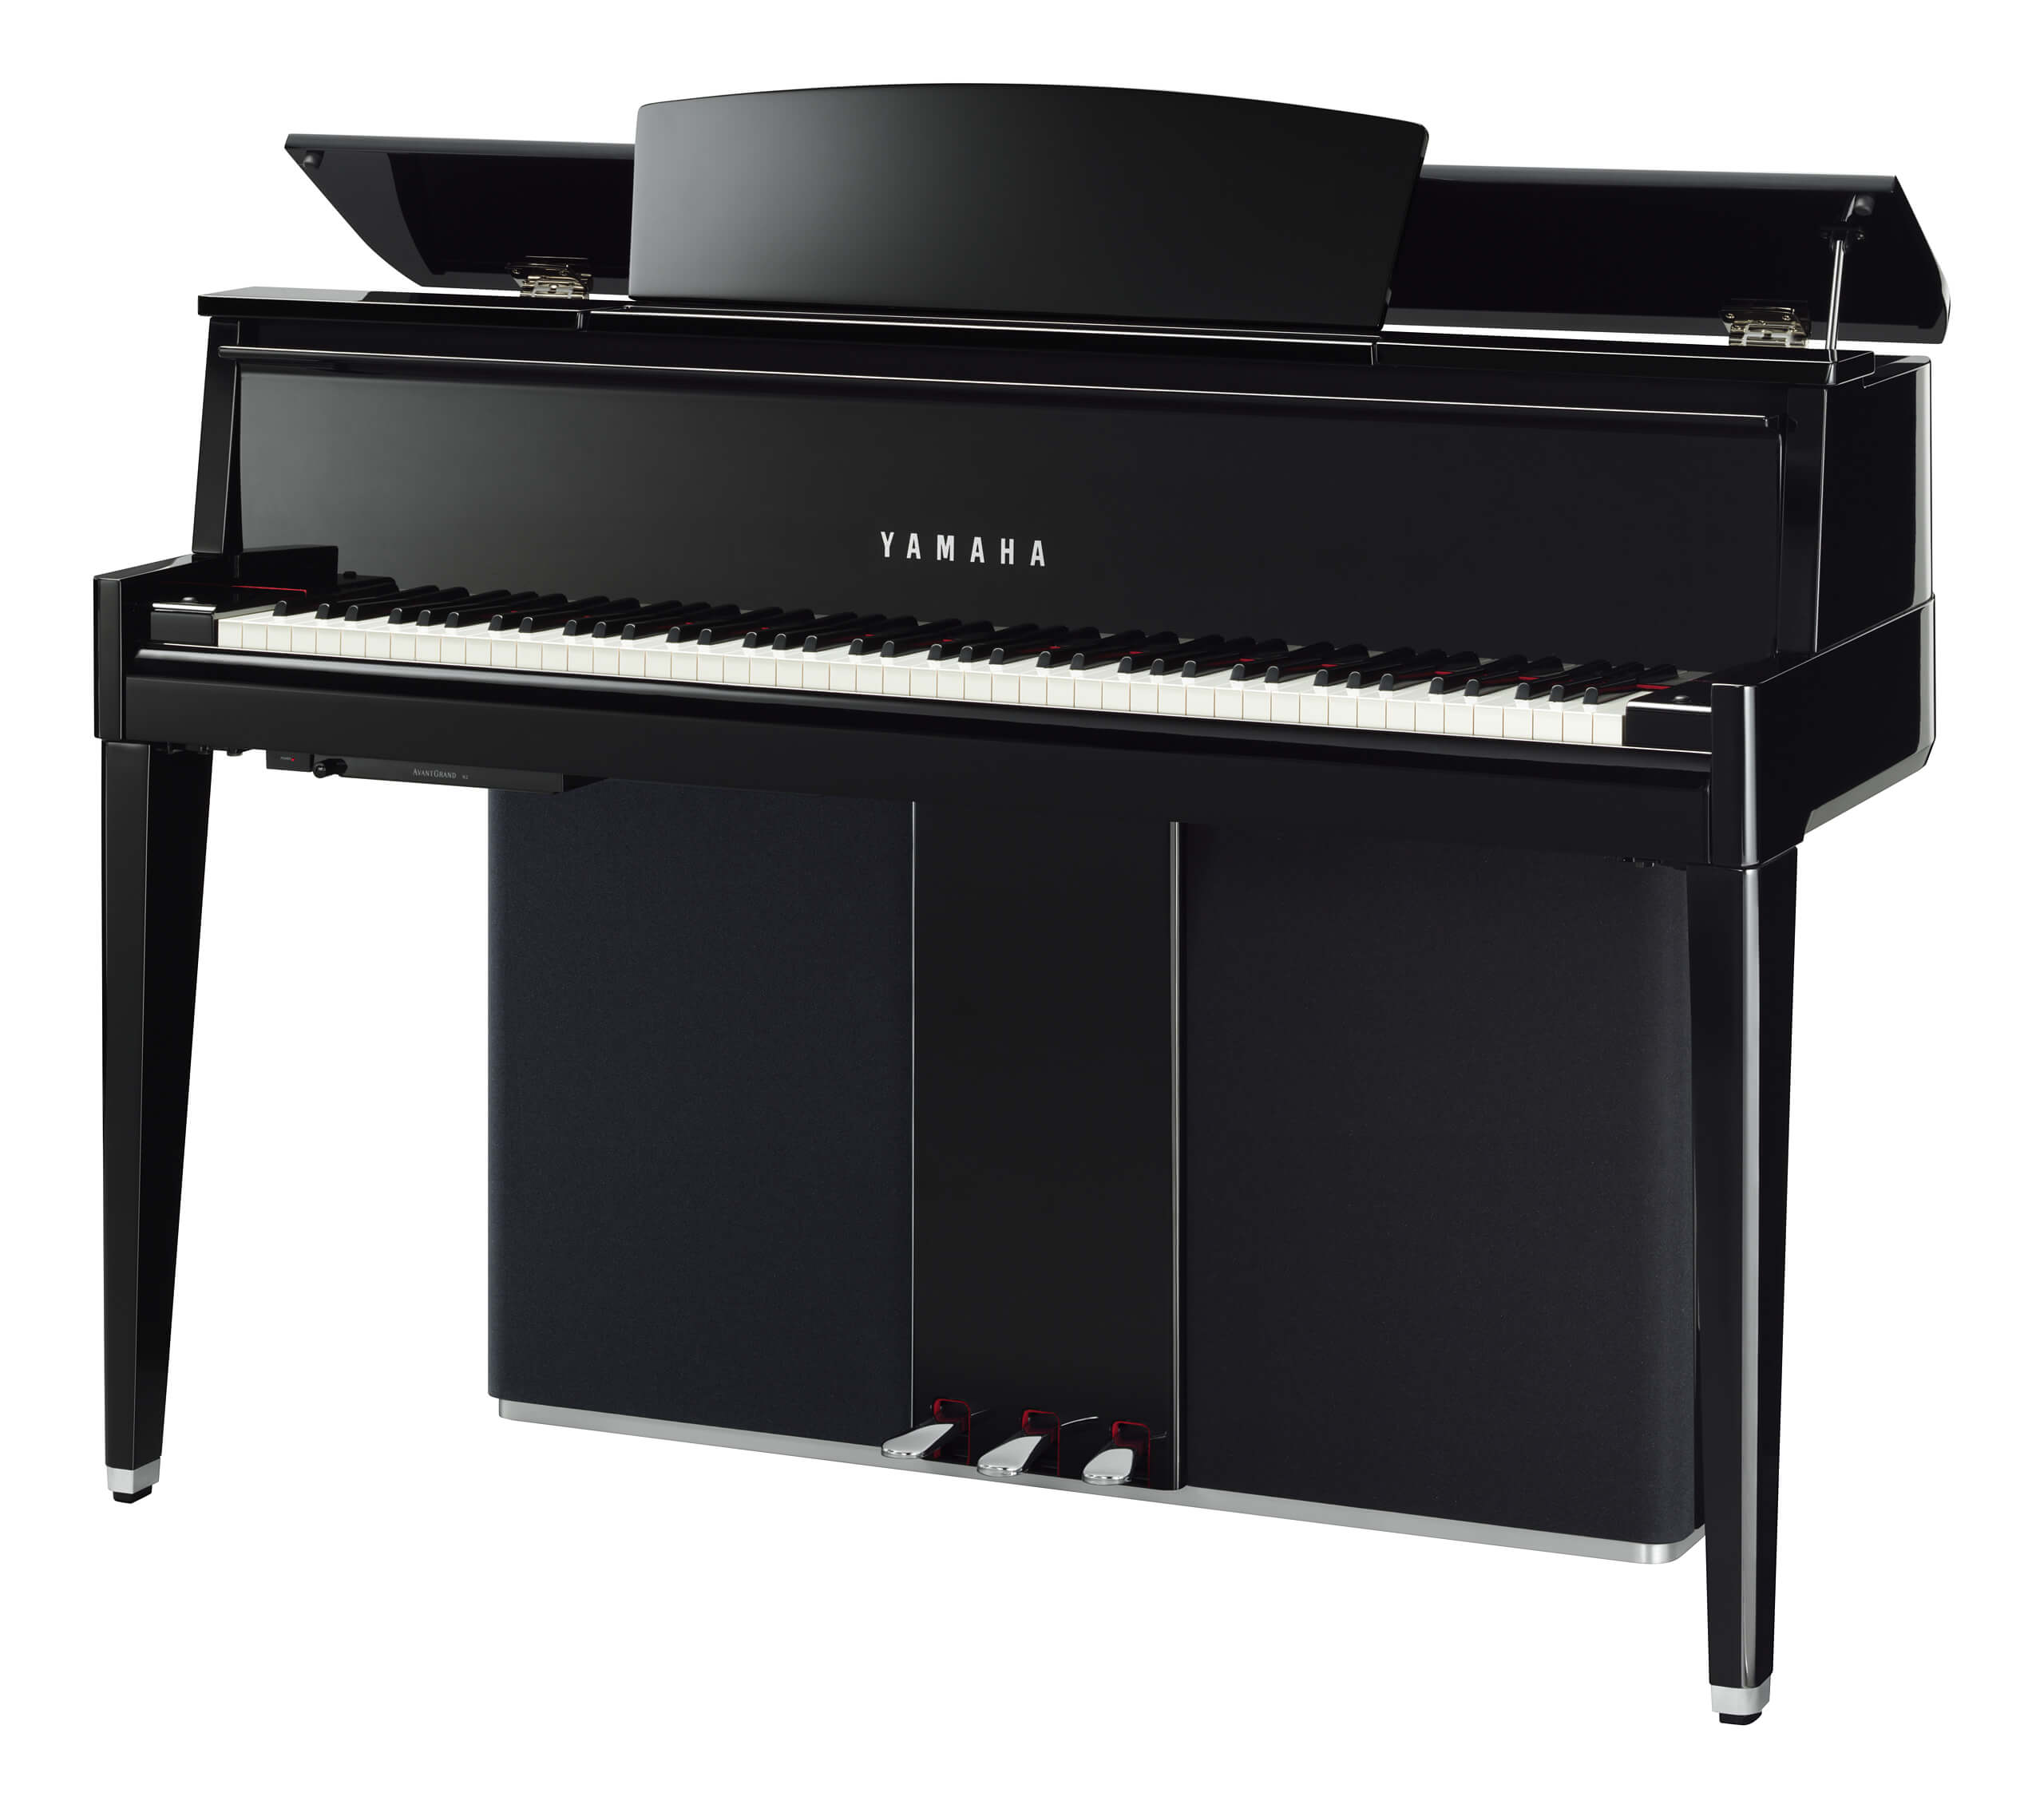 Piano Híbrido Yamaha N2 Negro Pulido